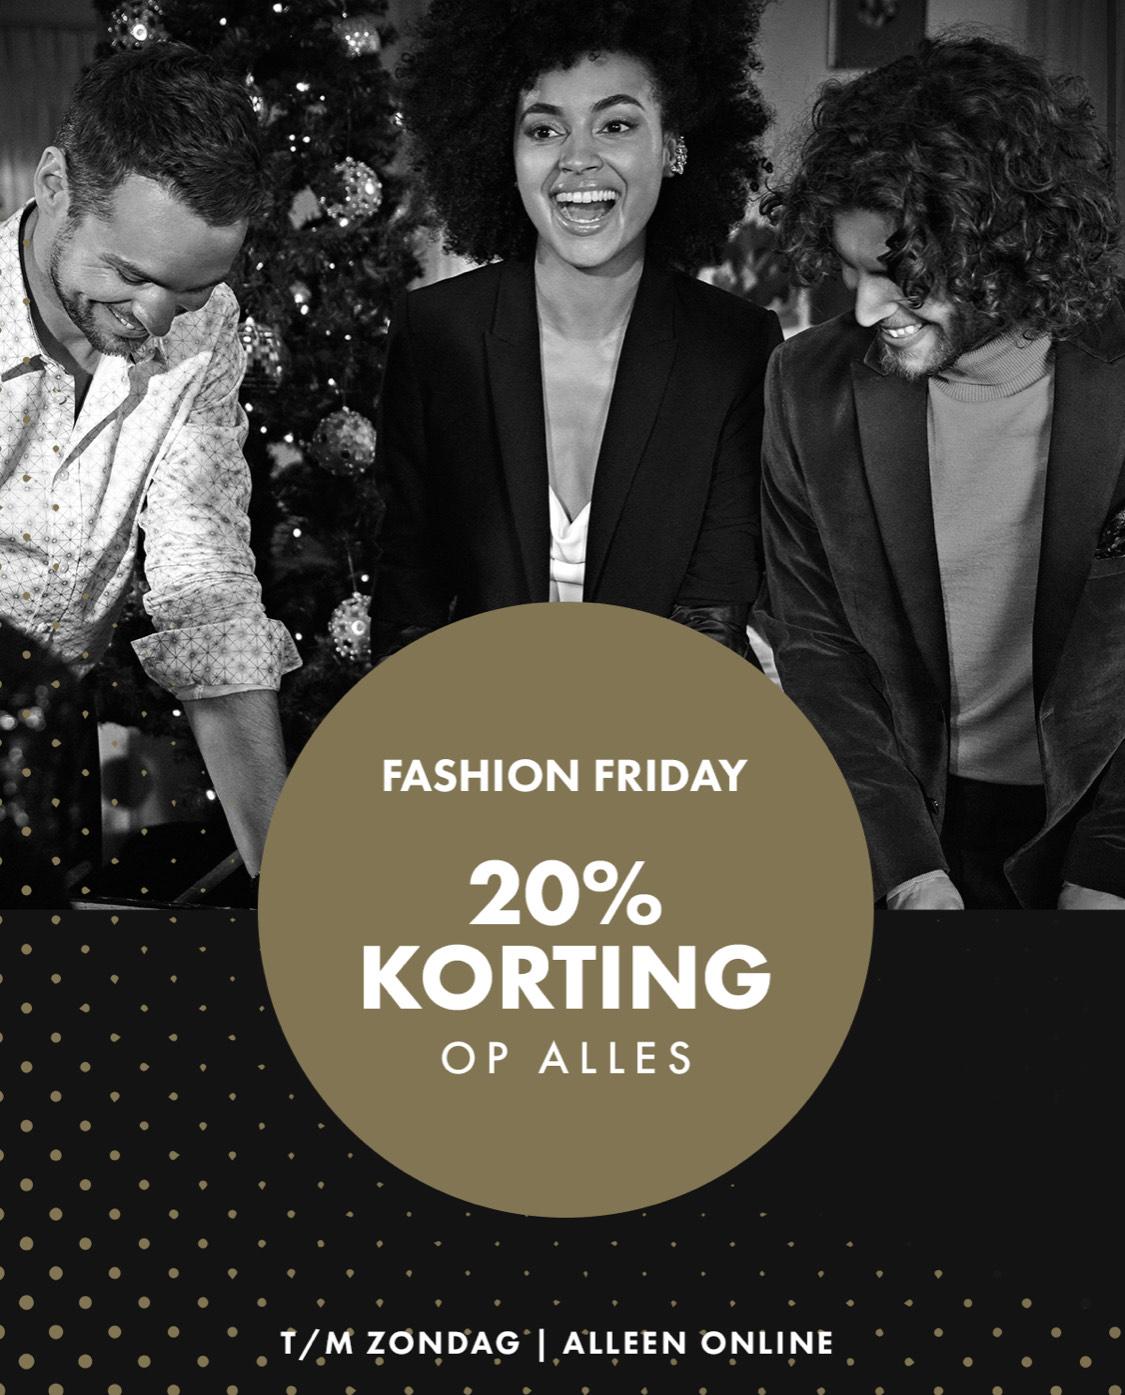 20% BF korting bij WE fashion + 10 EURO EXTRA KORTING!